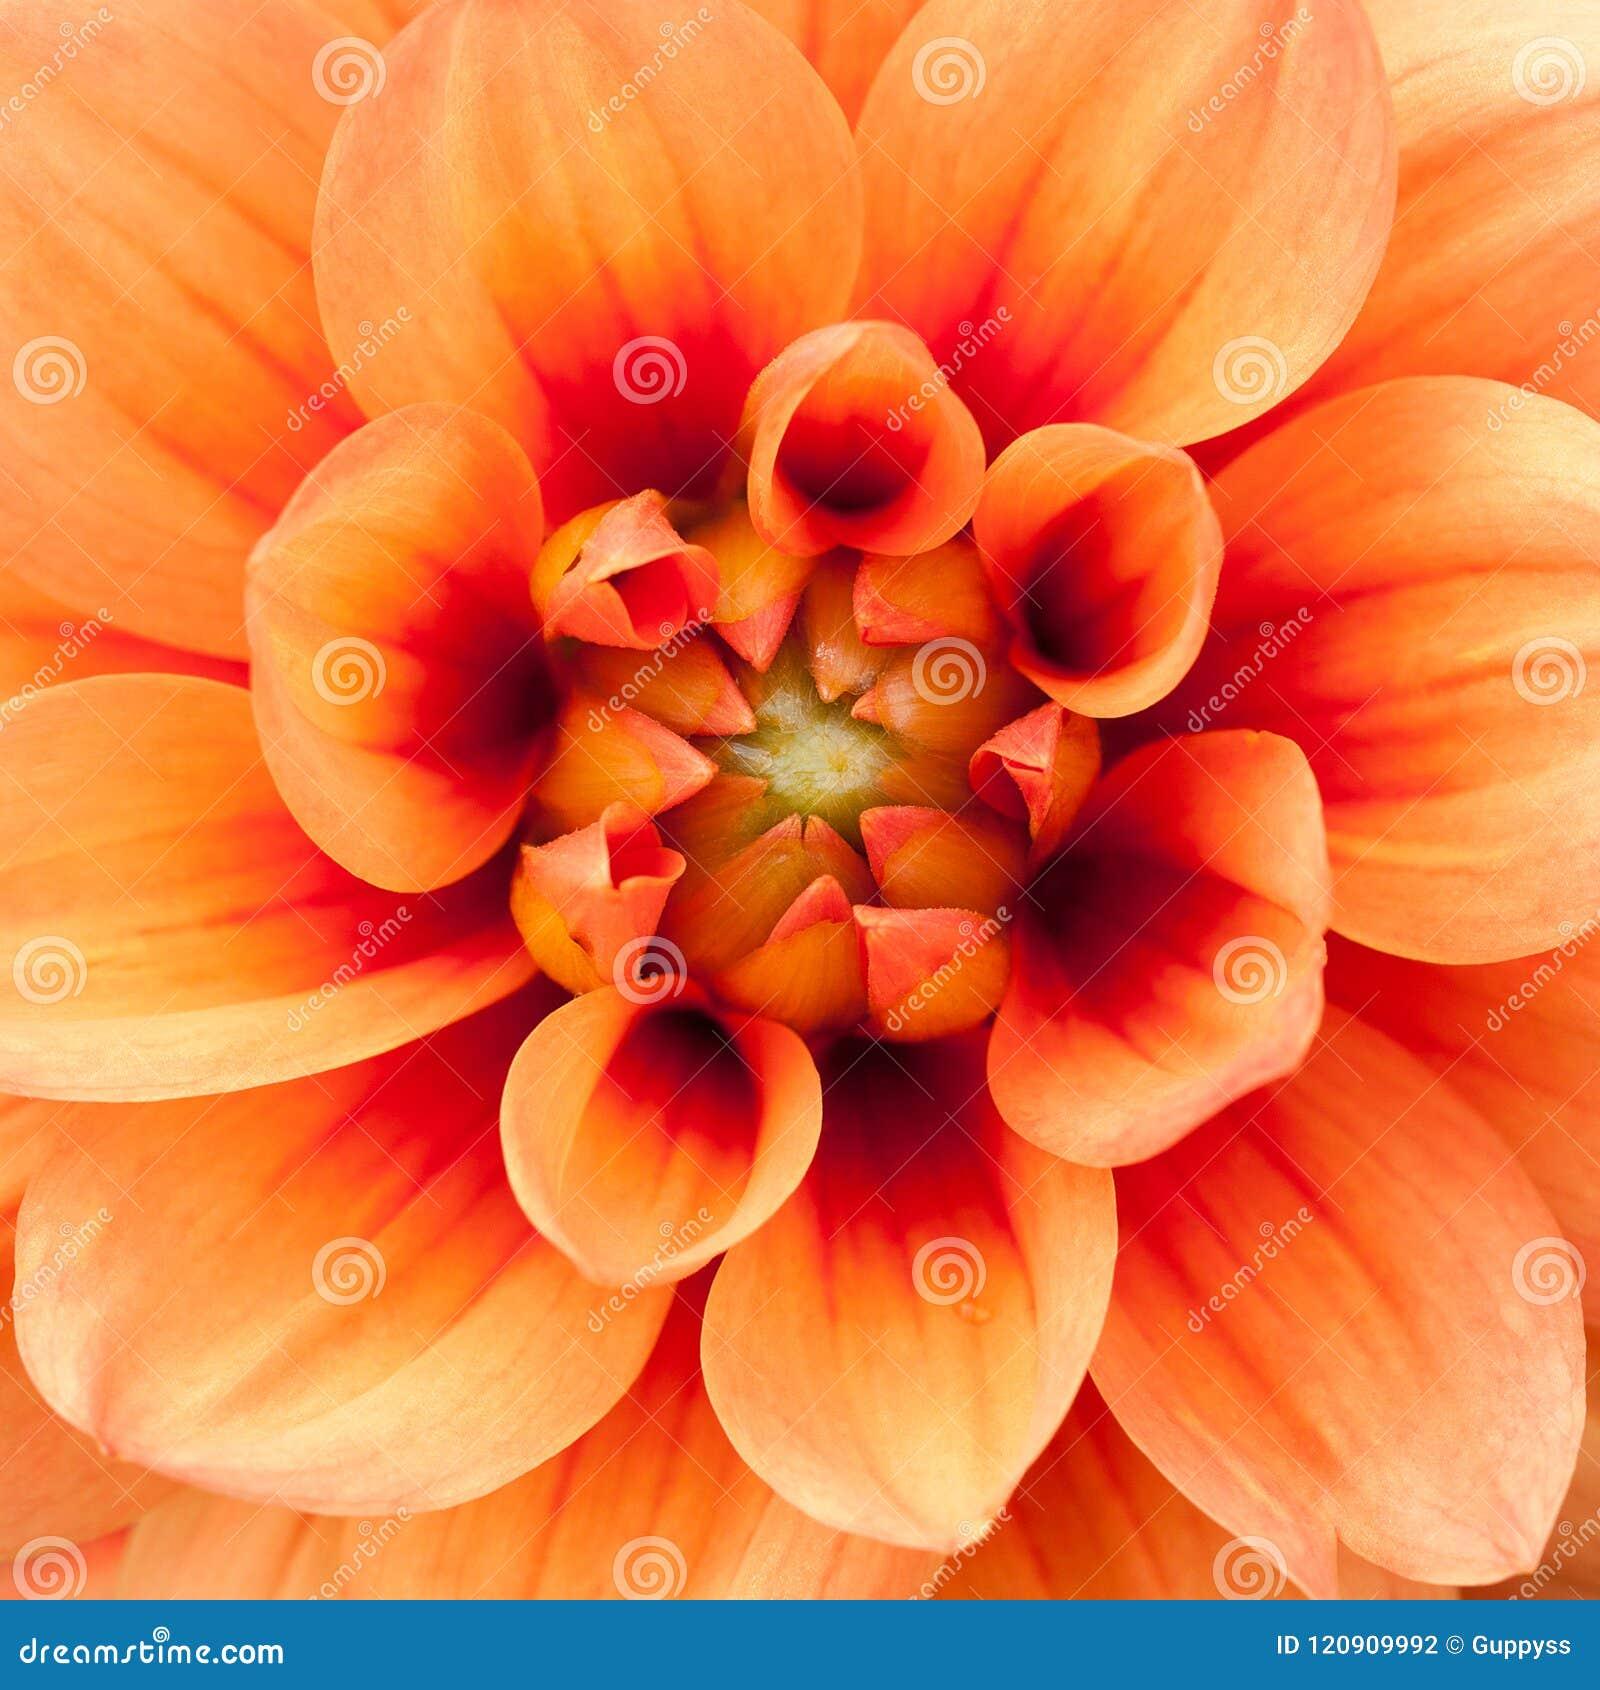 Wonderful Bright Orange Dahlia Stock Photo Image Of Dahlia Flower